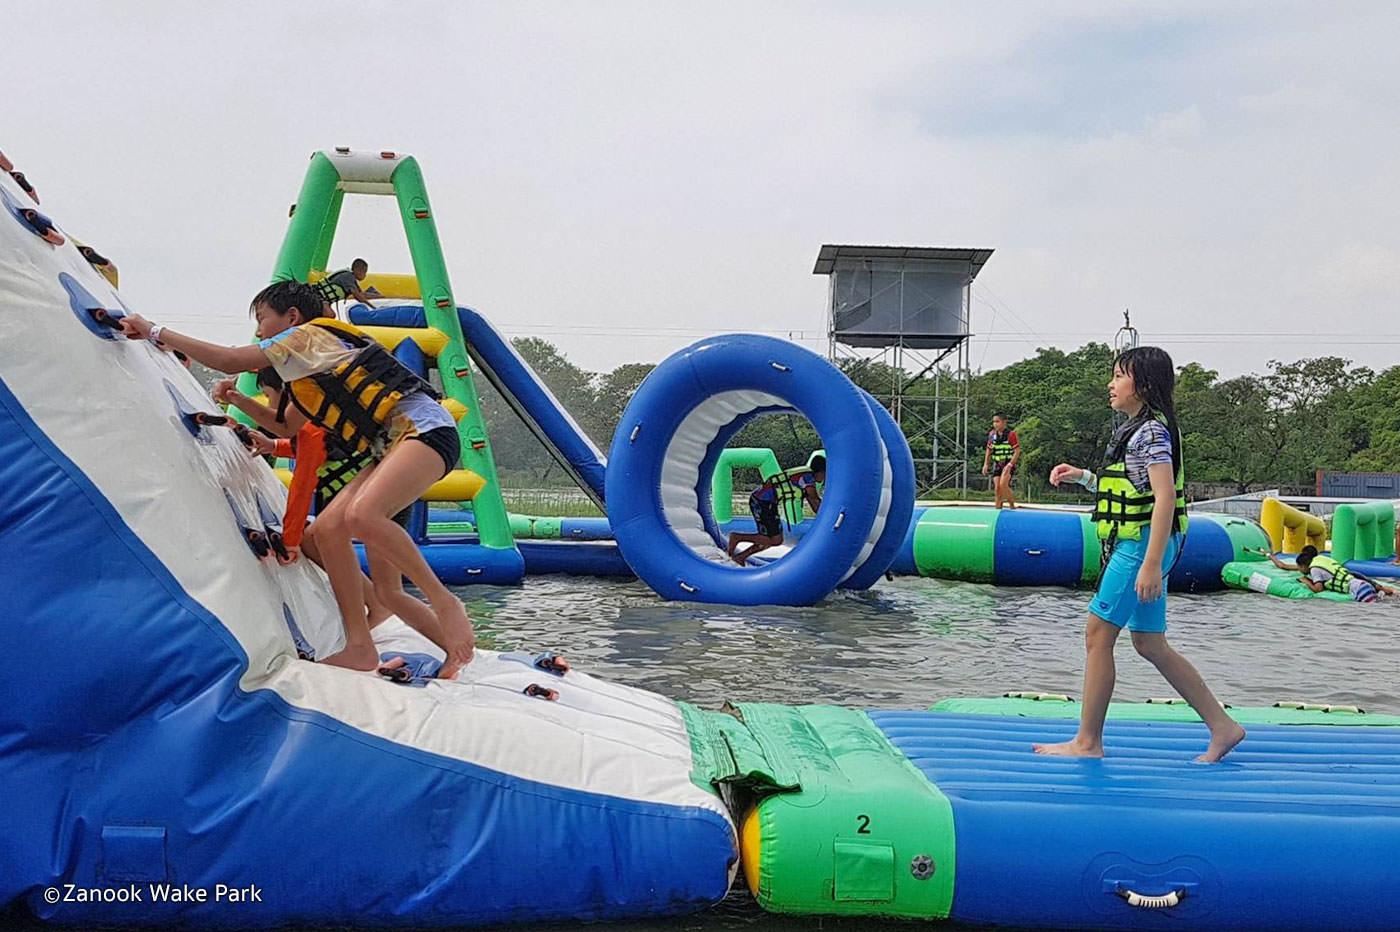 zanook-aqua-park.jpg